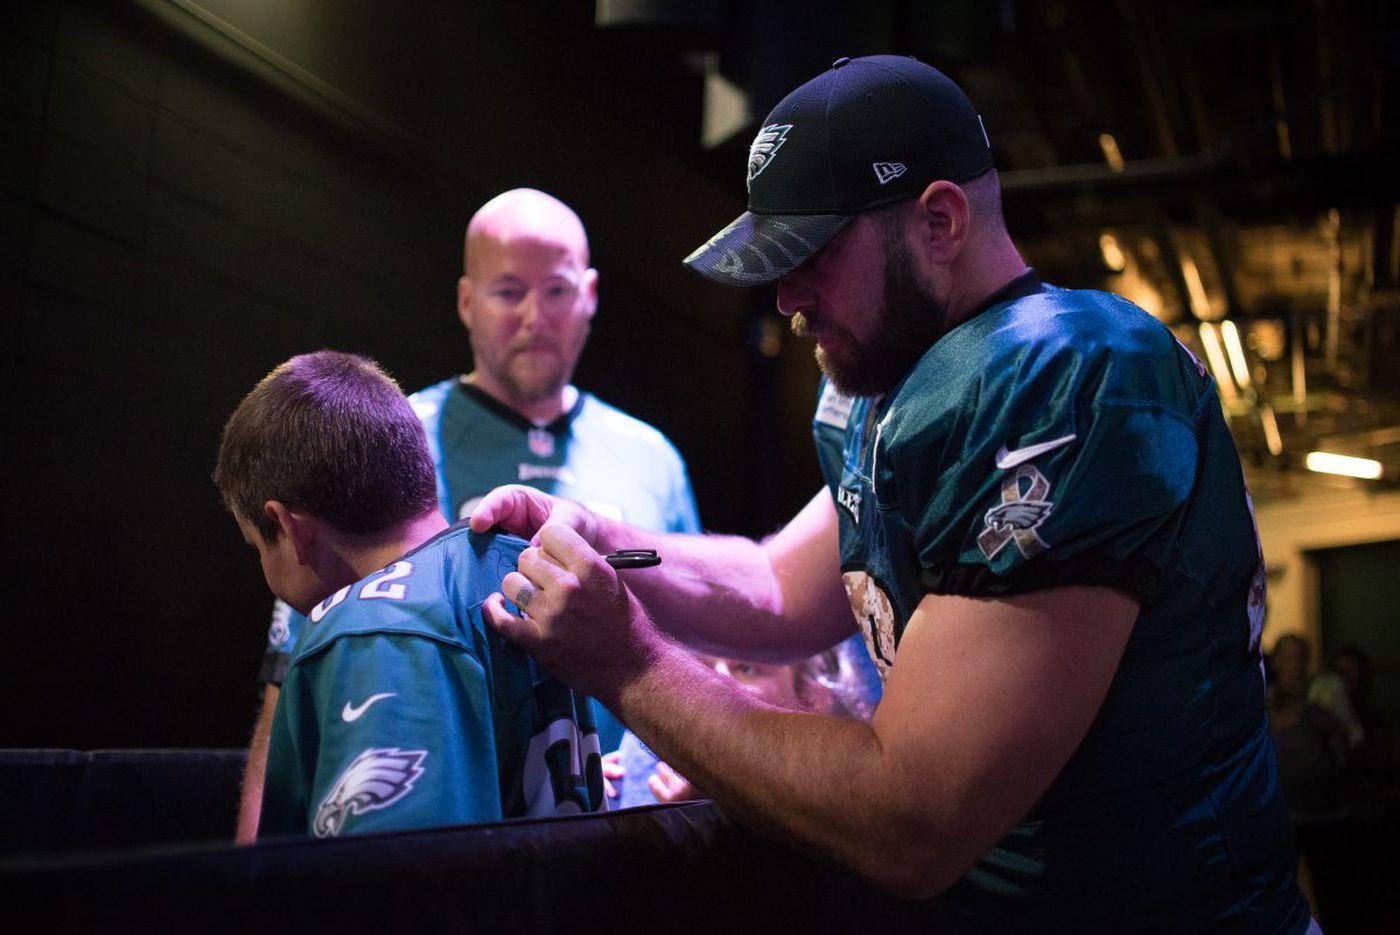 Eagles trade popular long snapper Jon Dorenbos to Saints for draft pick